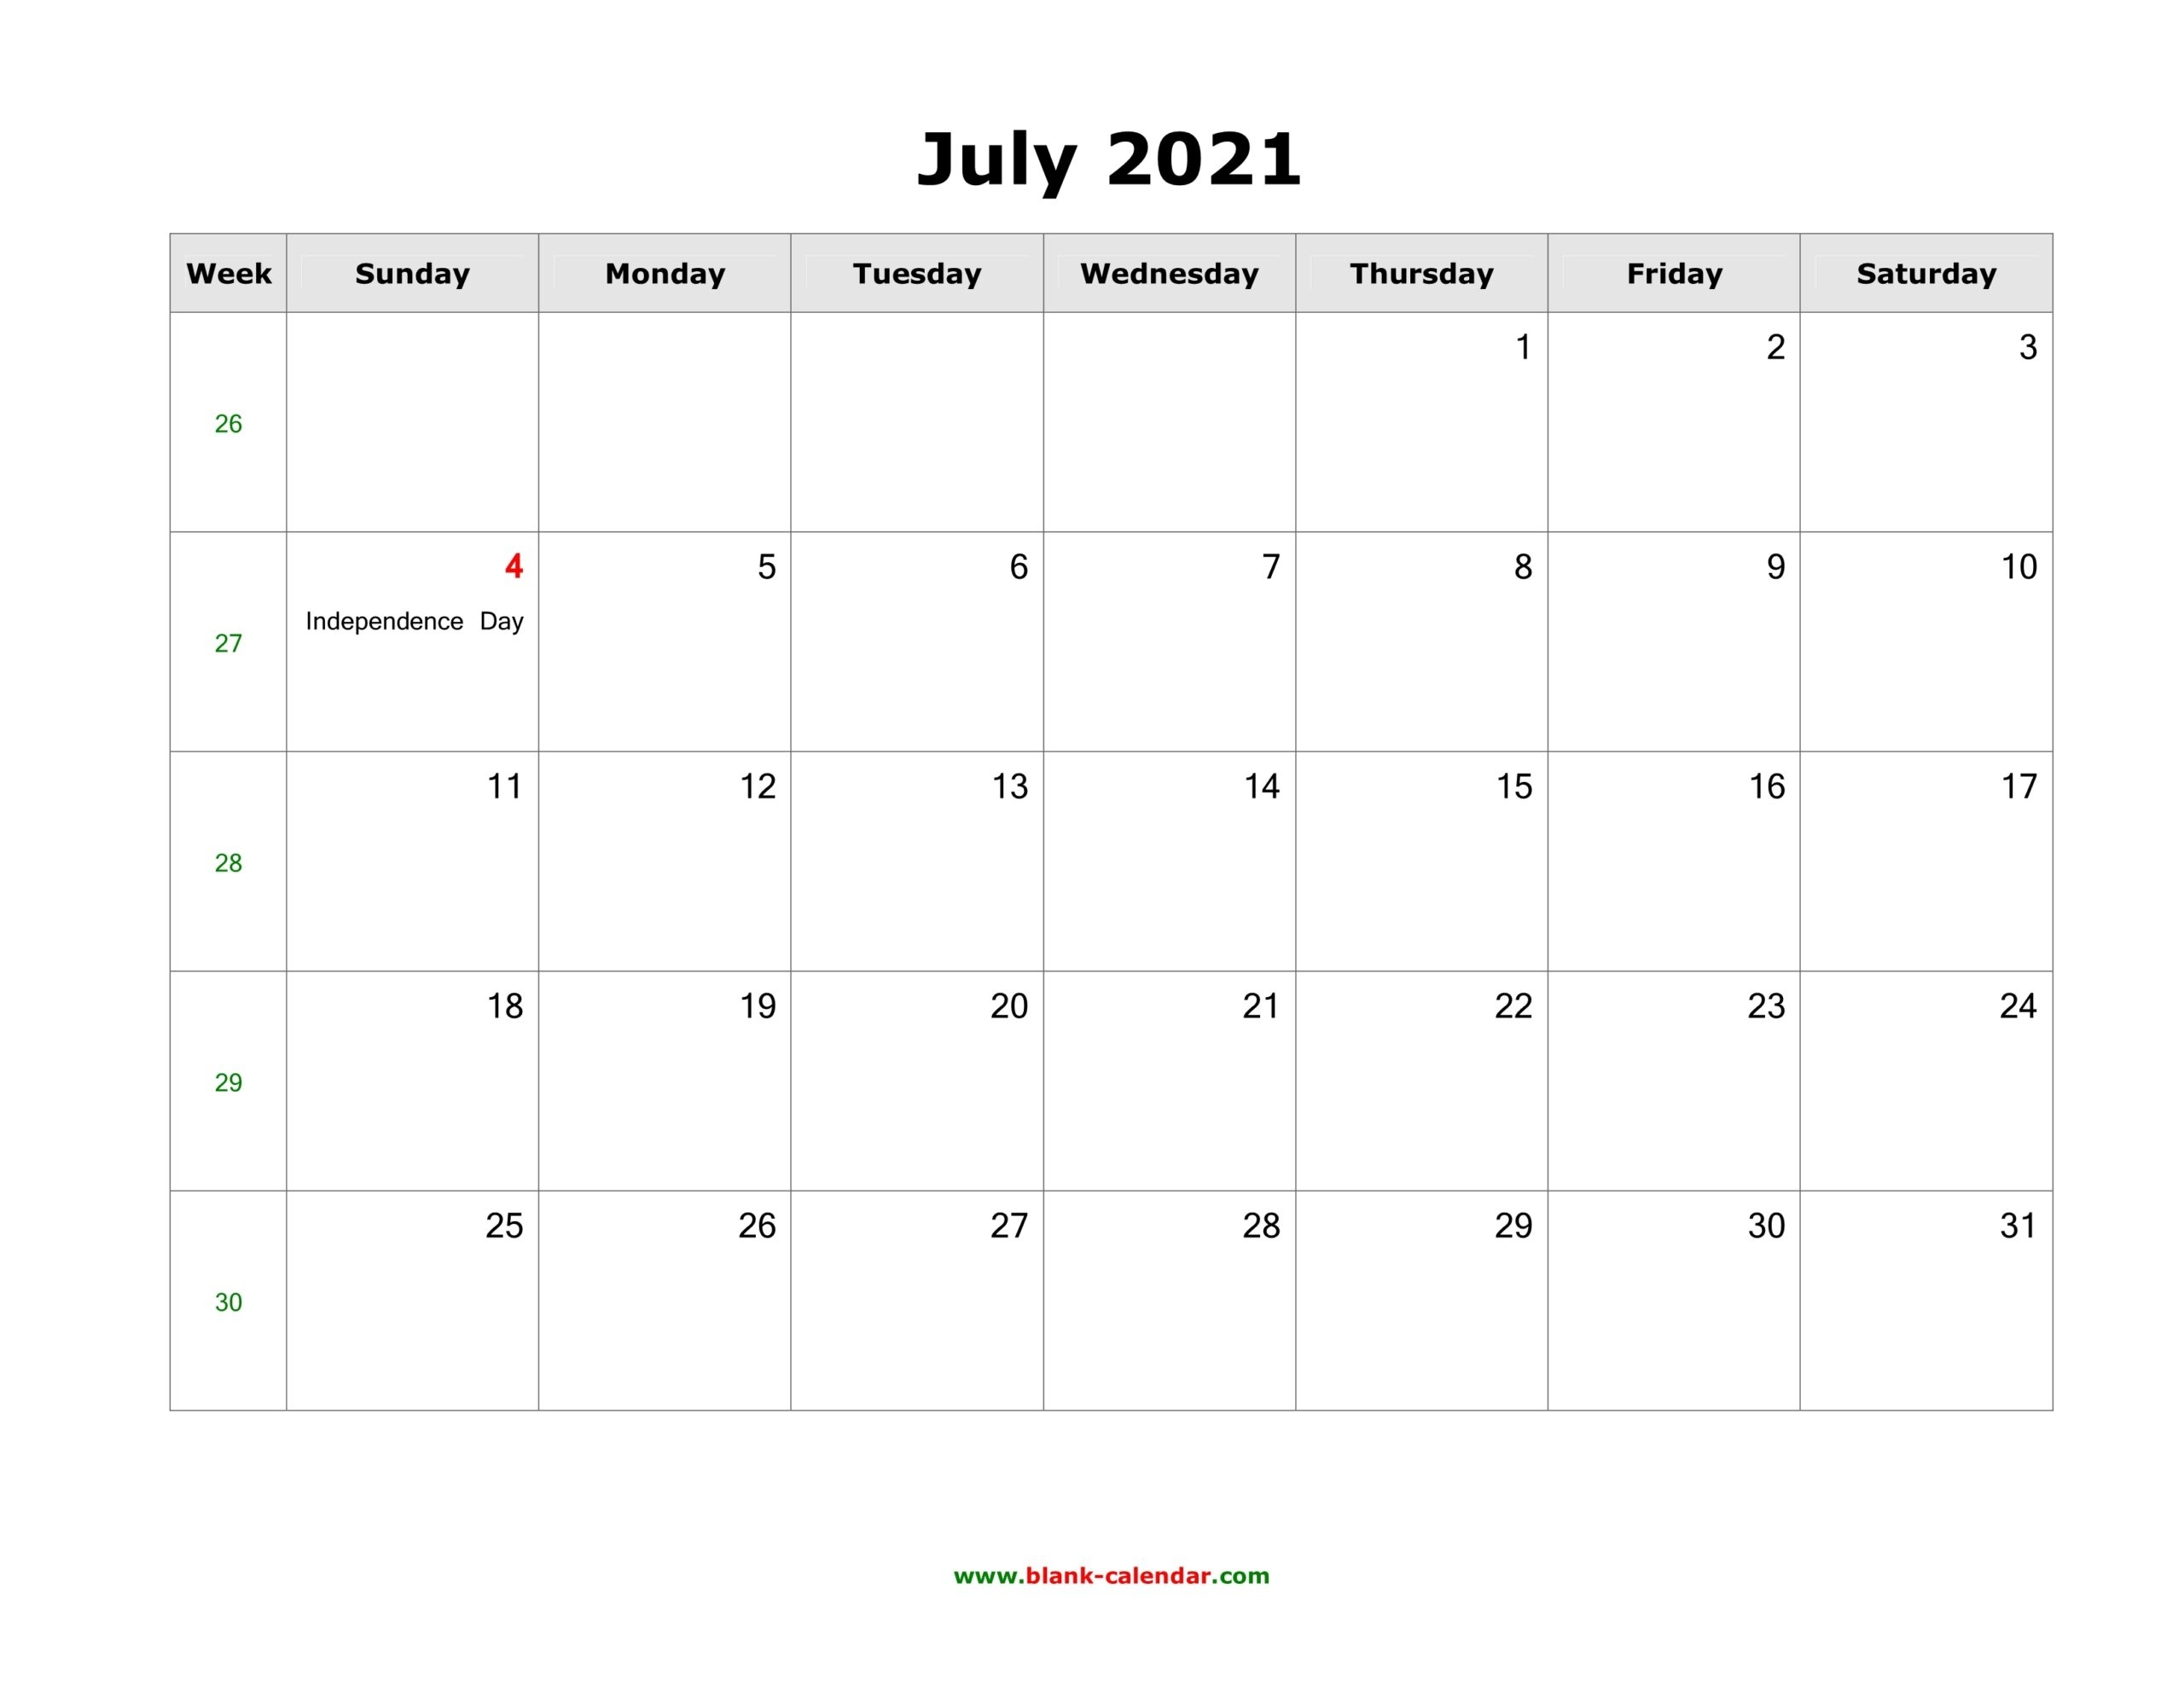 June 2021 Printable Calendar In Pdf, Word, Excel - Calendar End - 2020 Calendar Printable June 2021 Calendar With Holidays Usa